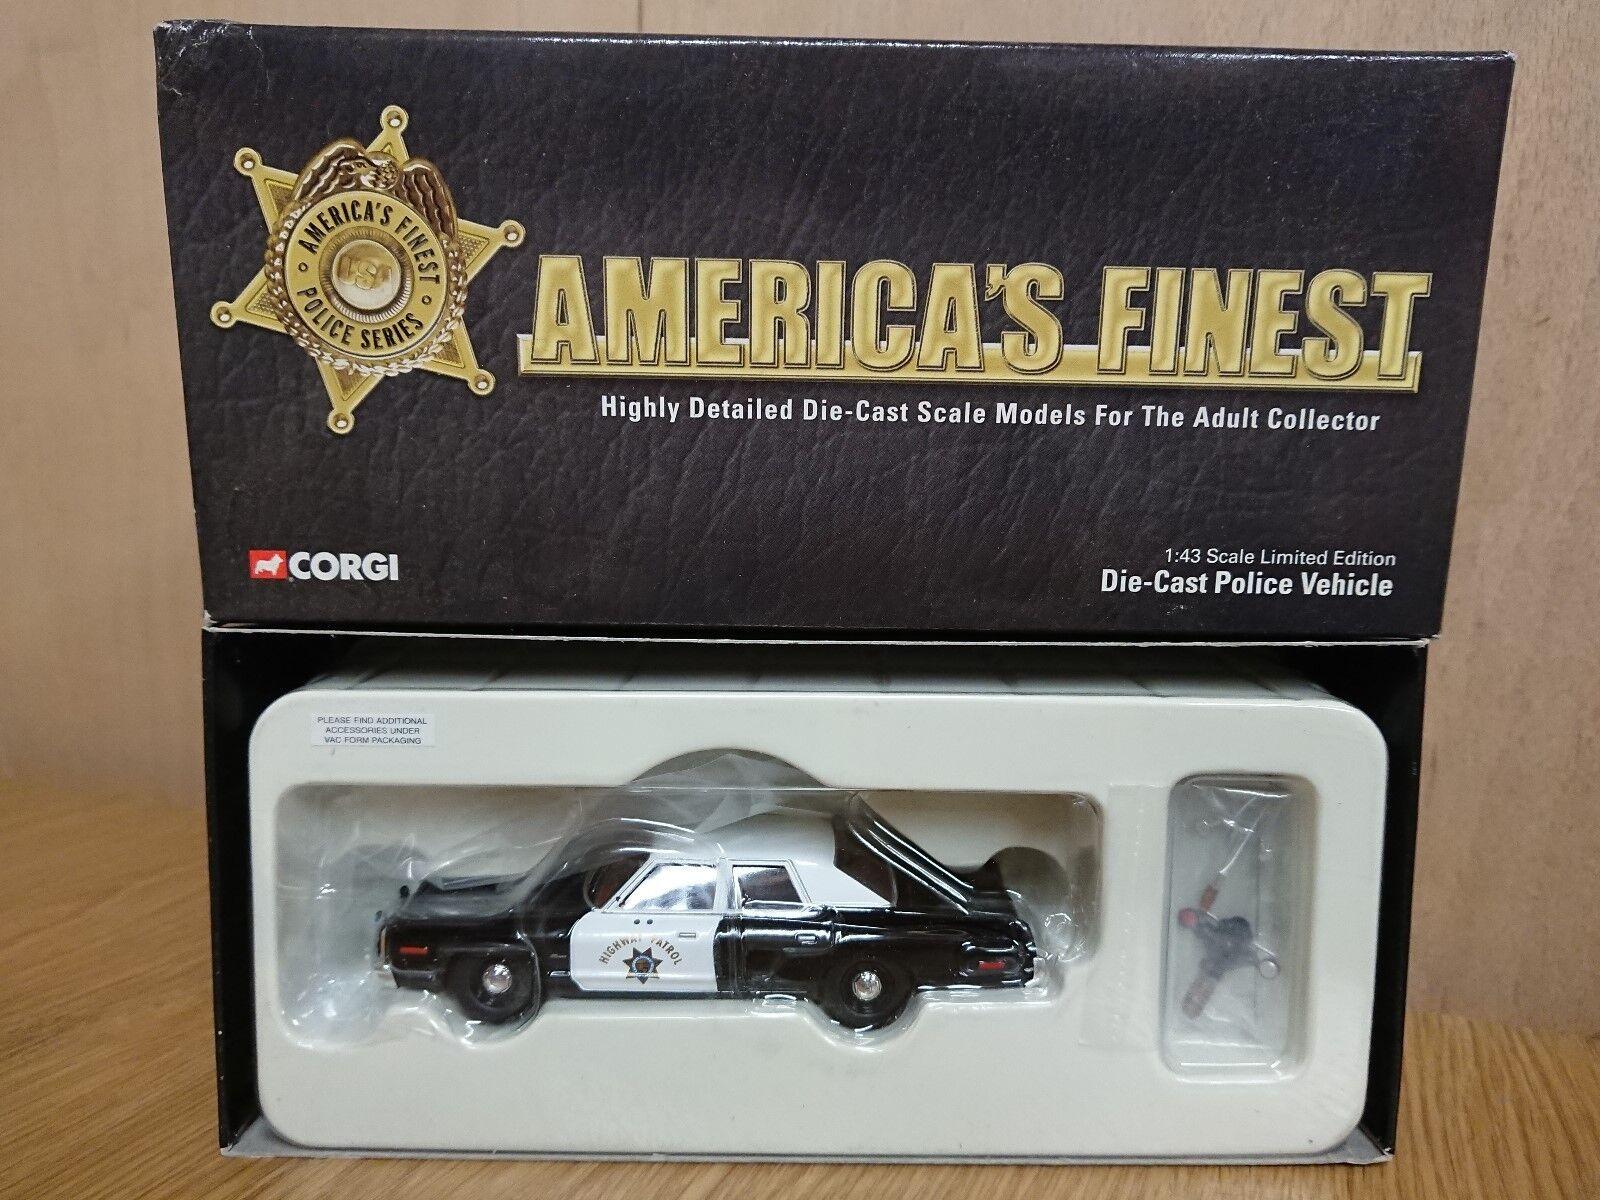 CORGI US06005 America's Finest Dodge Monaco California Highway Patrol LTD ED.